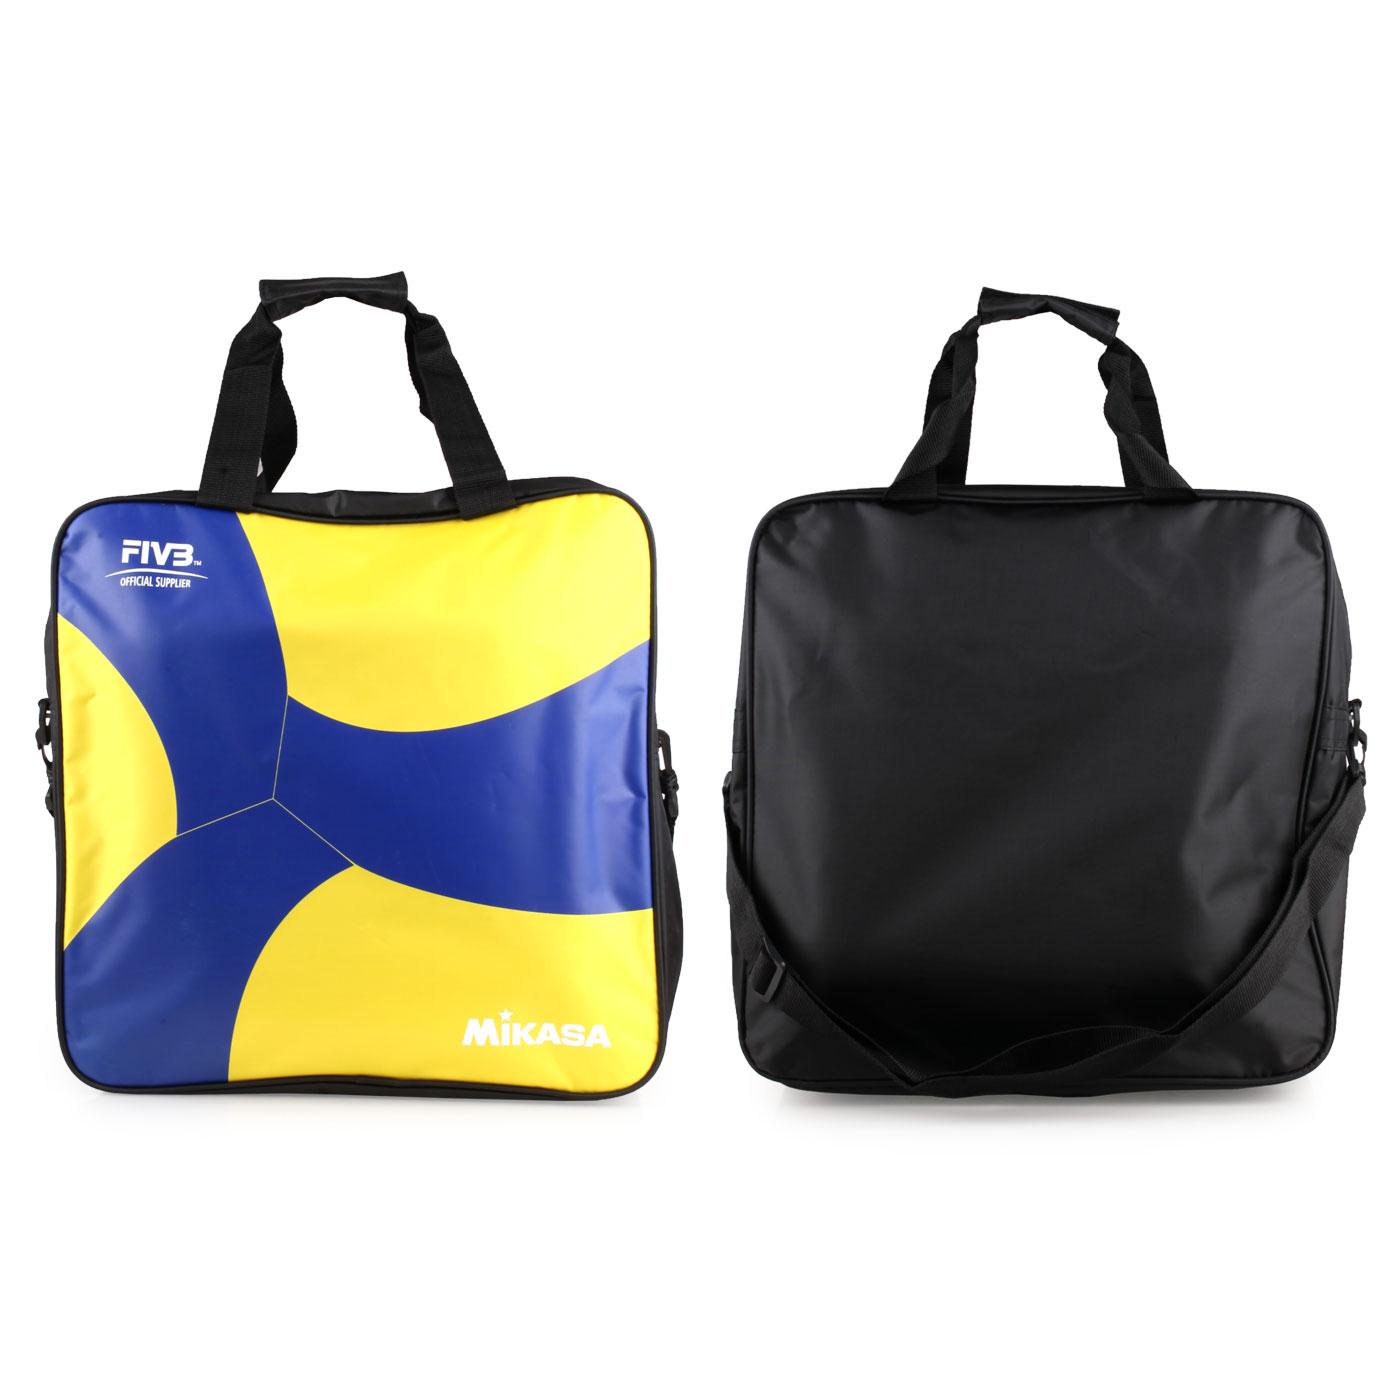 MIKASA 排球袋(4顆裝) MKAC-BG240W-YB - 藍黃黑